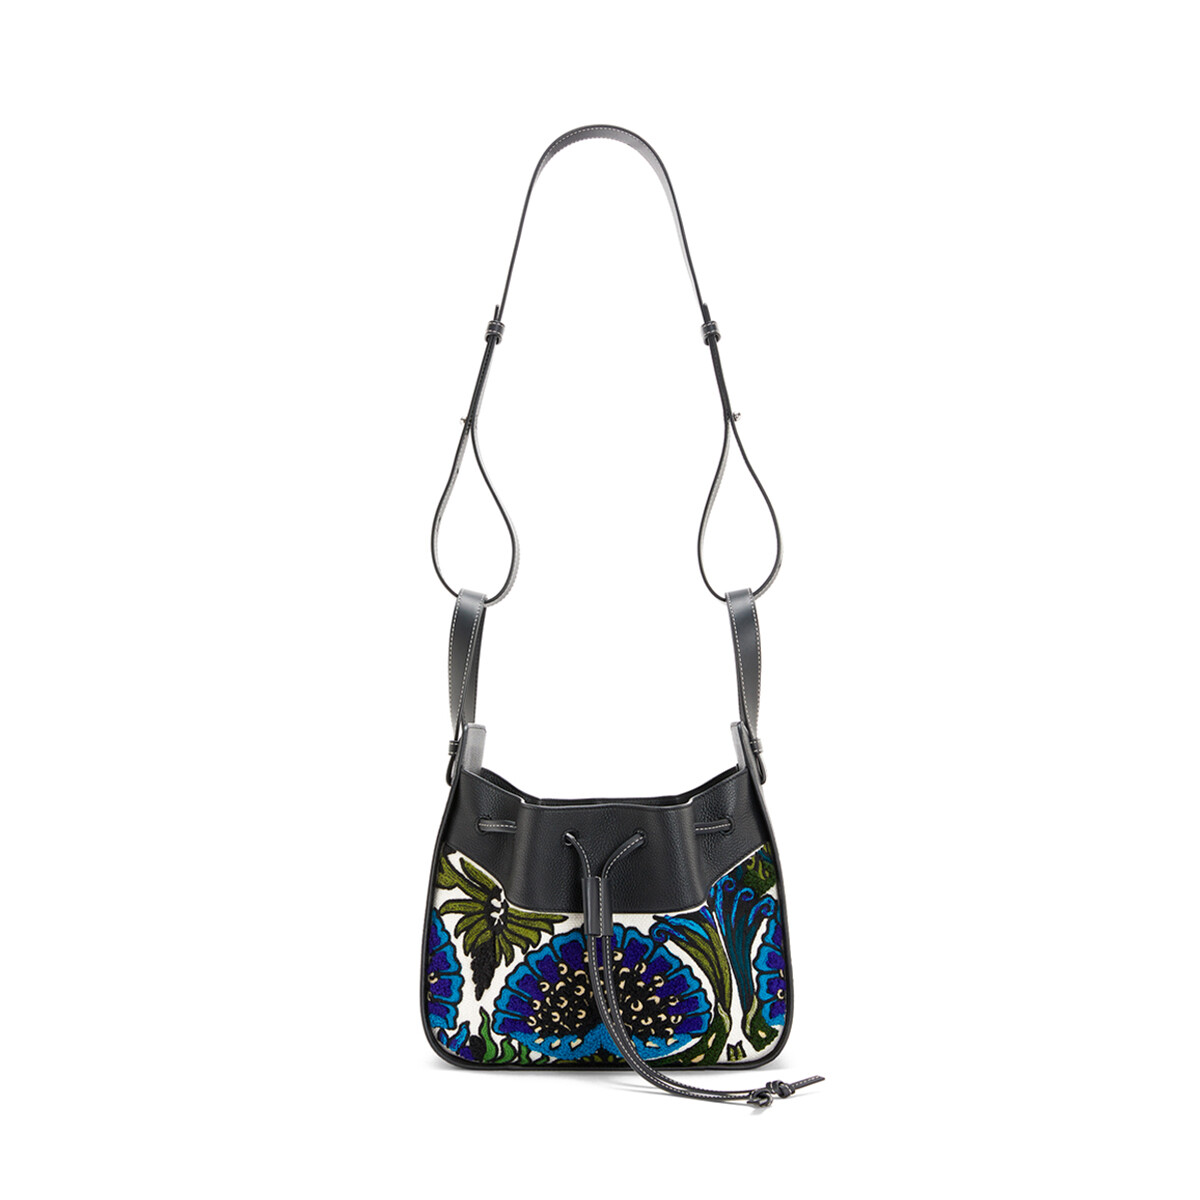 LOEWE Hammock Drawstring Floral Small Bag Peacock Blue front